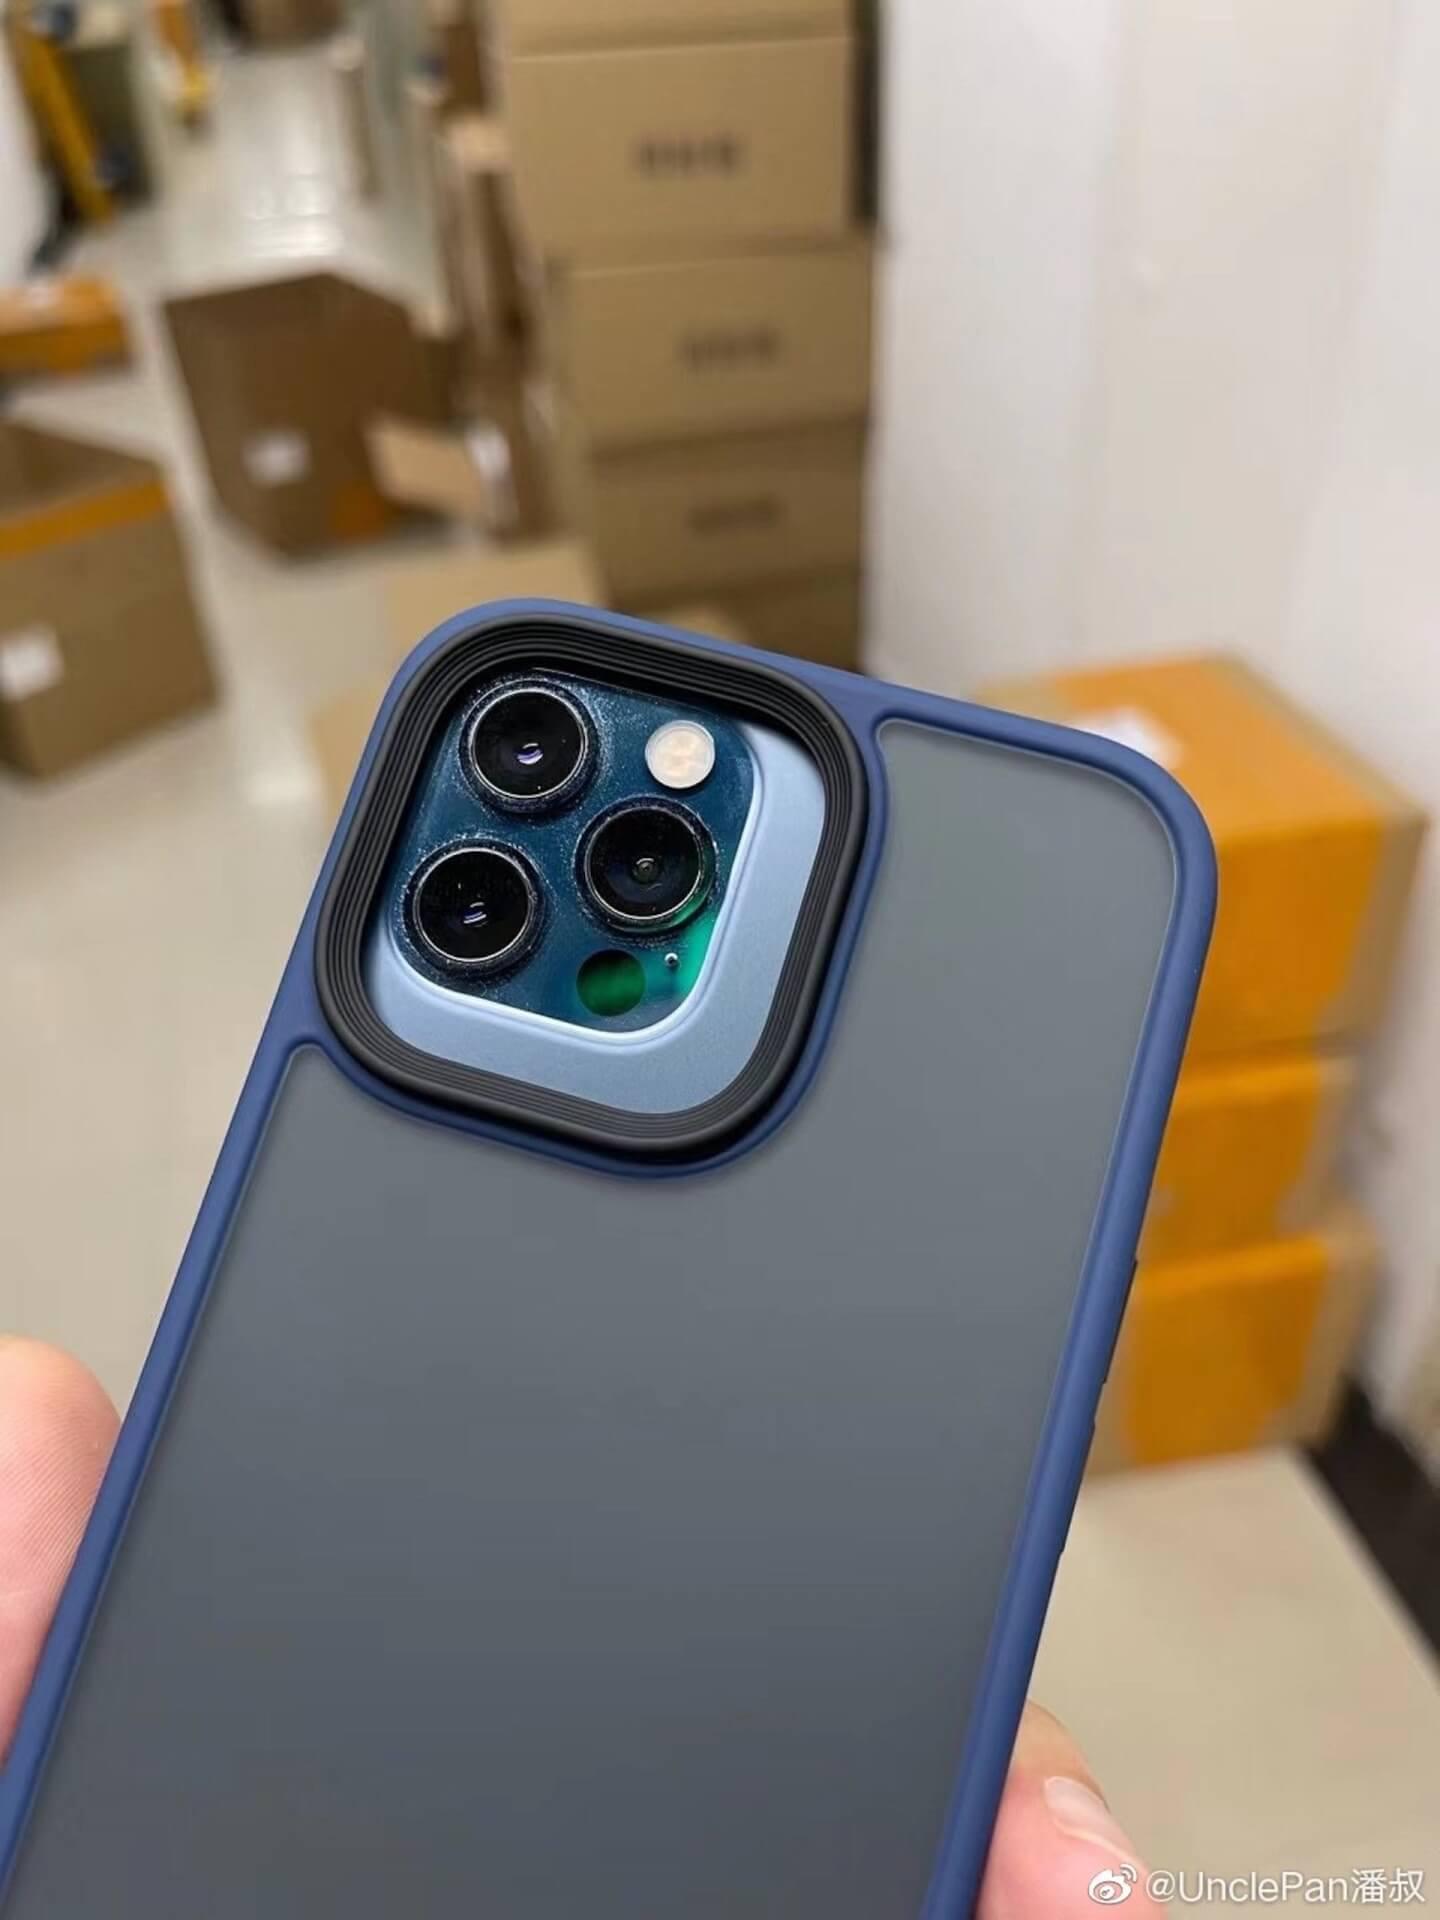 iPhone 13シリーズのカメラレンズエリアはかなり大きくなる!?スマホケースをiPhone 12シリーズに装着した画像が流出か tech210707_iphone13_main